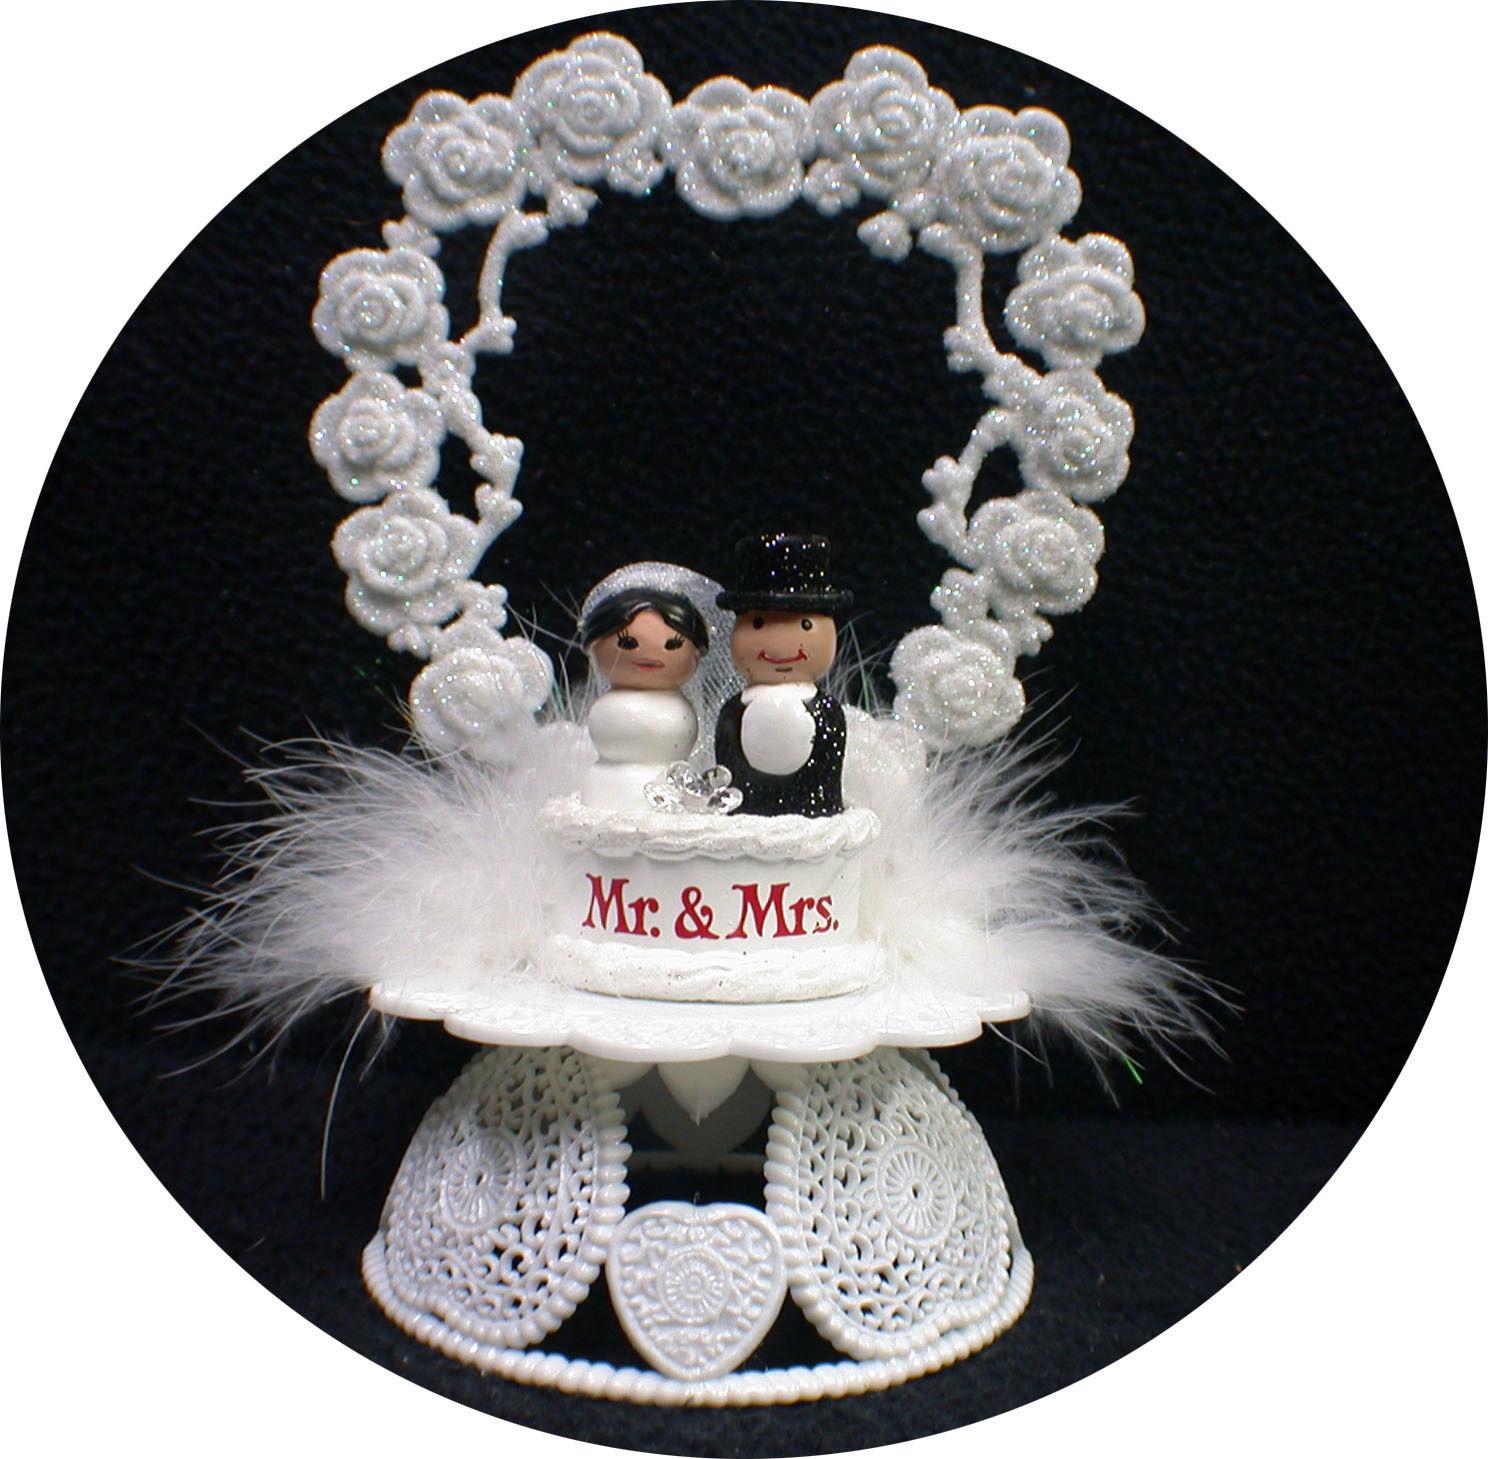 Adorable Mr & Mrs Wedding Cake Topper Bride Groom Top Heart Ornament centerpiece - $19.31